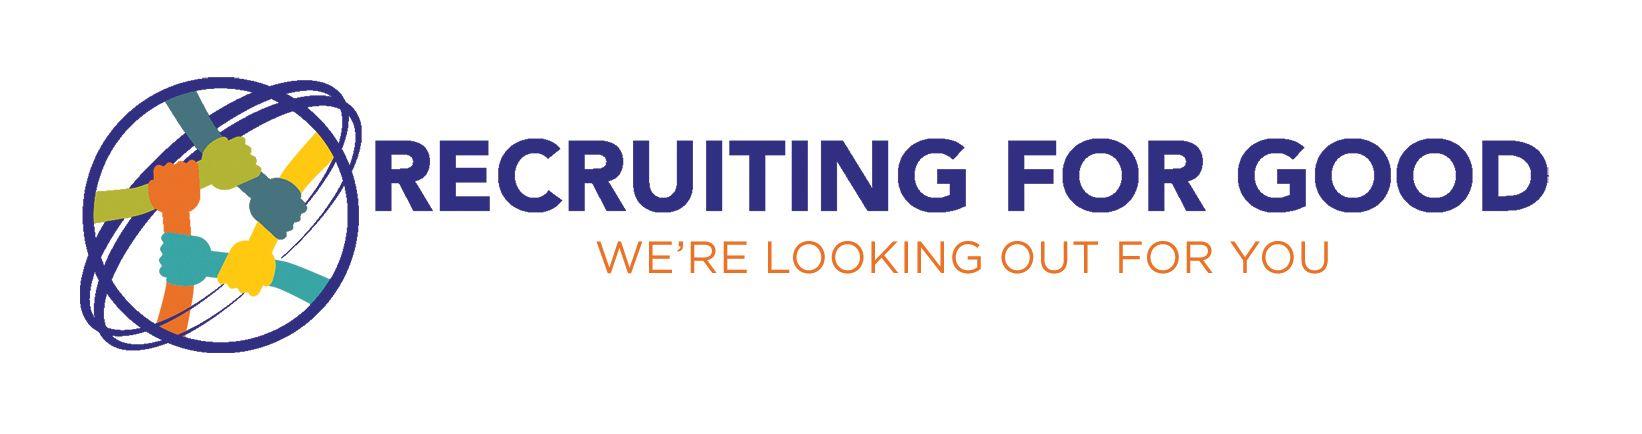 Recruiting for Good logo